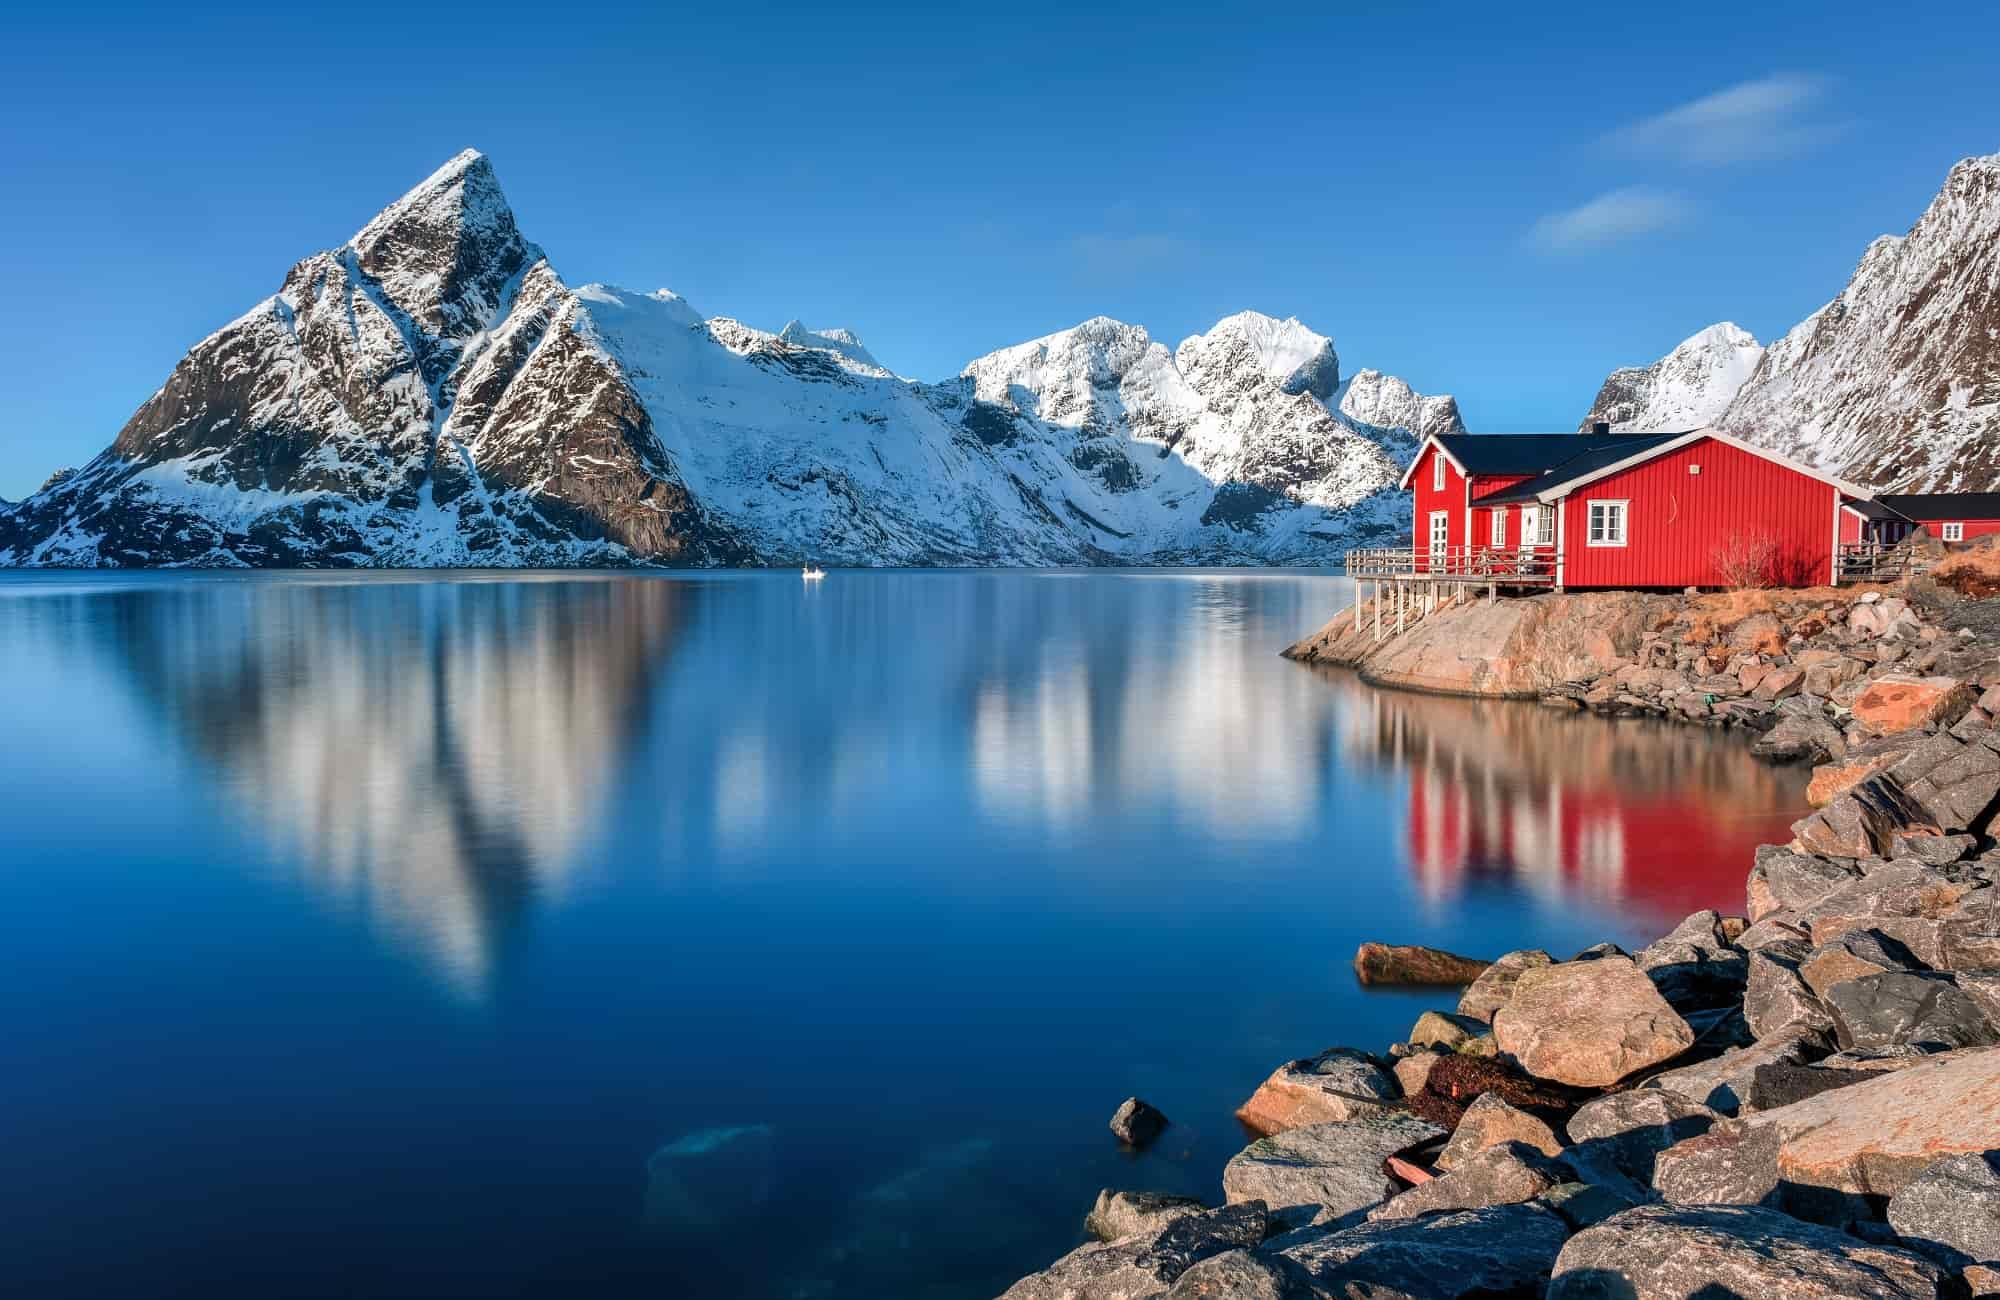 Voyage Norvège - Fjords norvégiens - Amplitudes